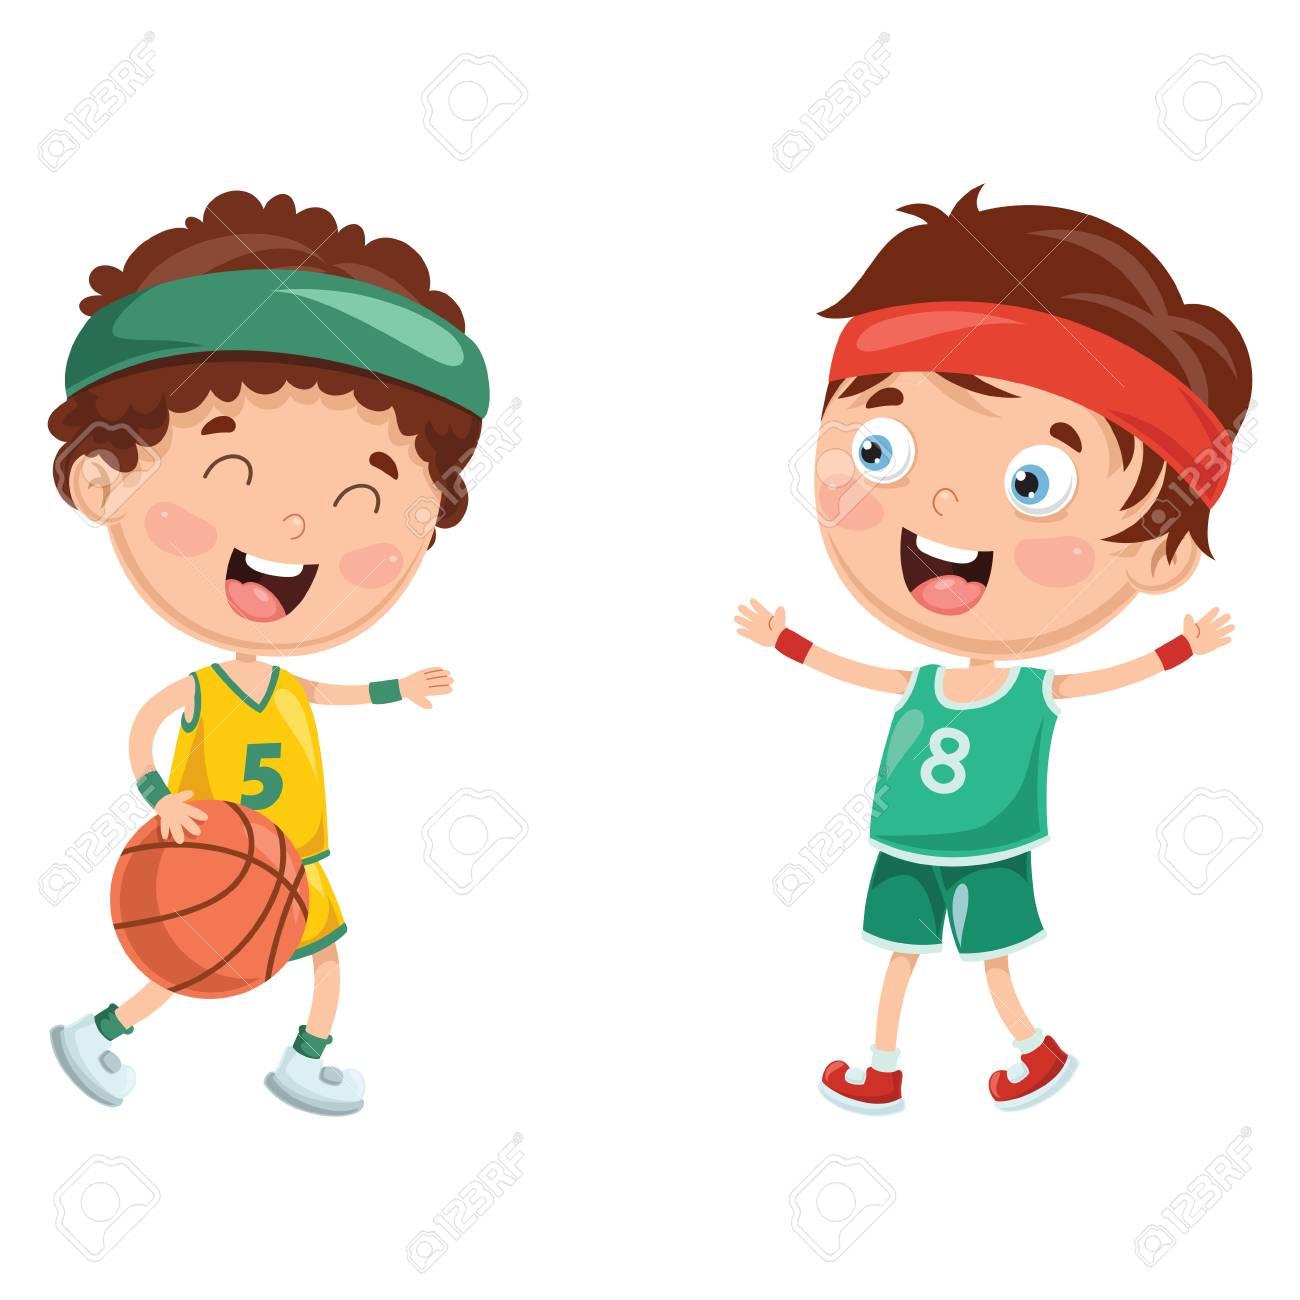 Vector Illustration Of Kids Playing Basketball.